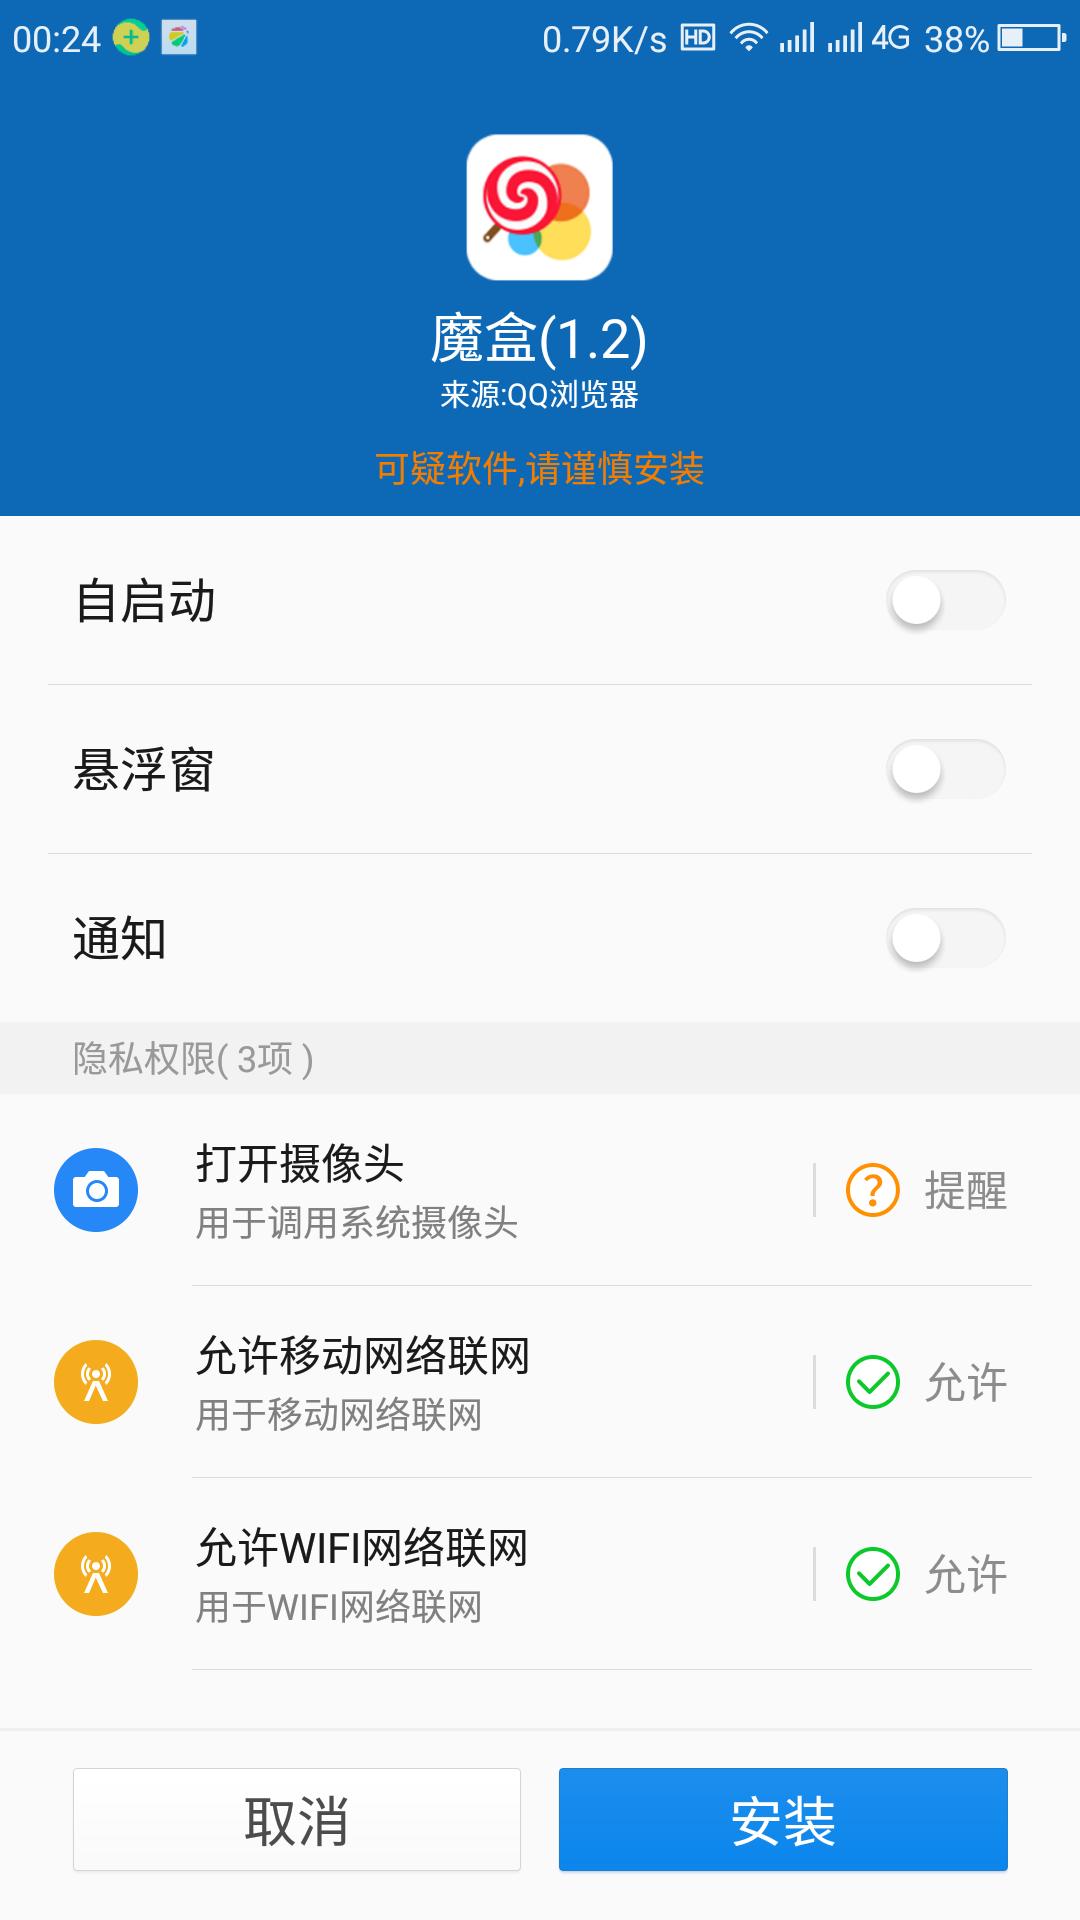 Screenshot_2017-09-24-00-24-51.png